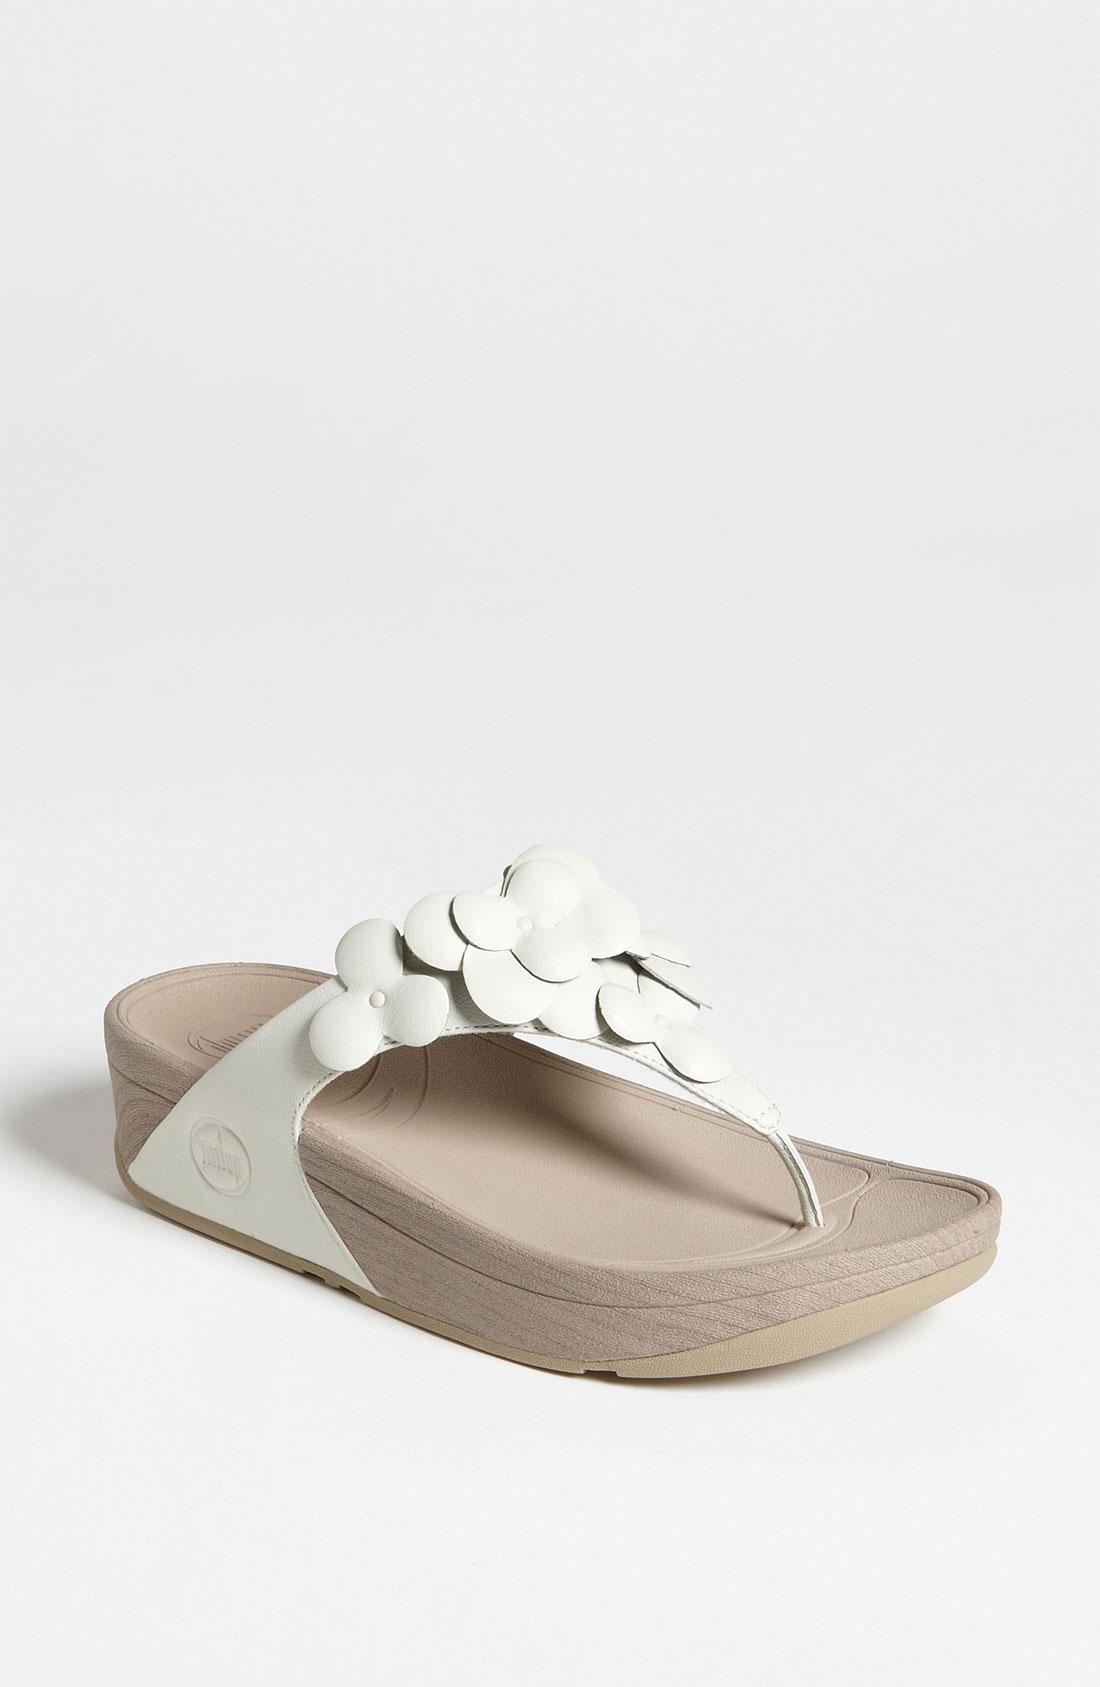 3bdc100f338d Fitflop Lunetta Sandals Urban White